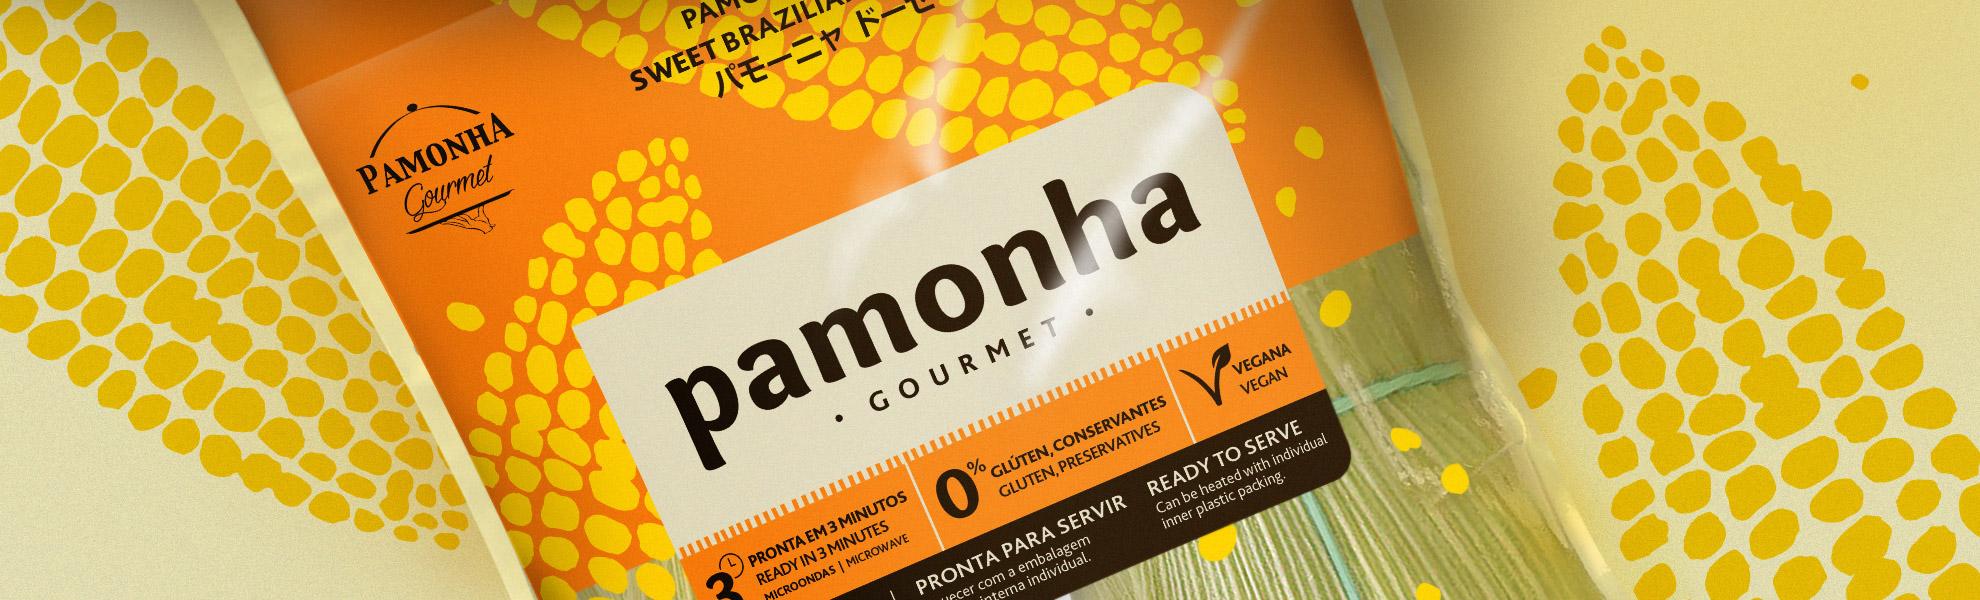 chelles-e-hayashi-design-portfolio-pamonha-gourmet-packaging-graphic